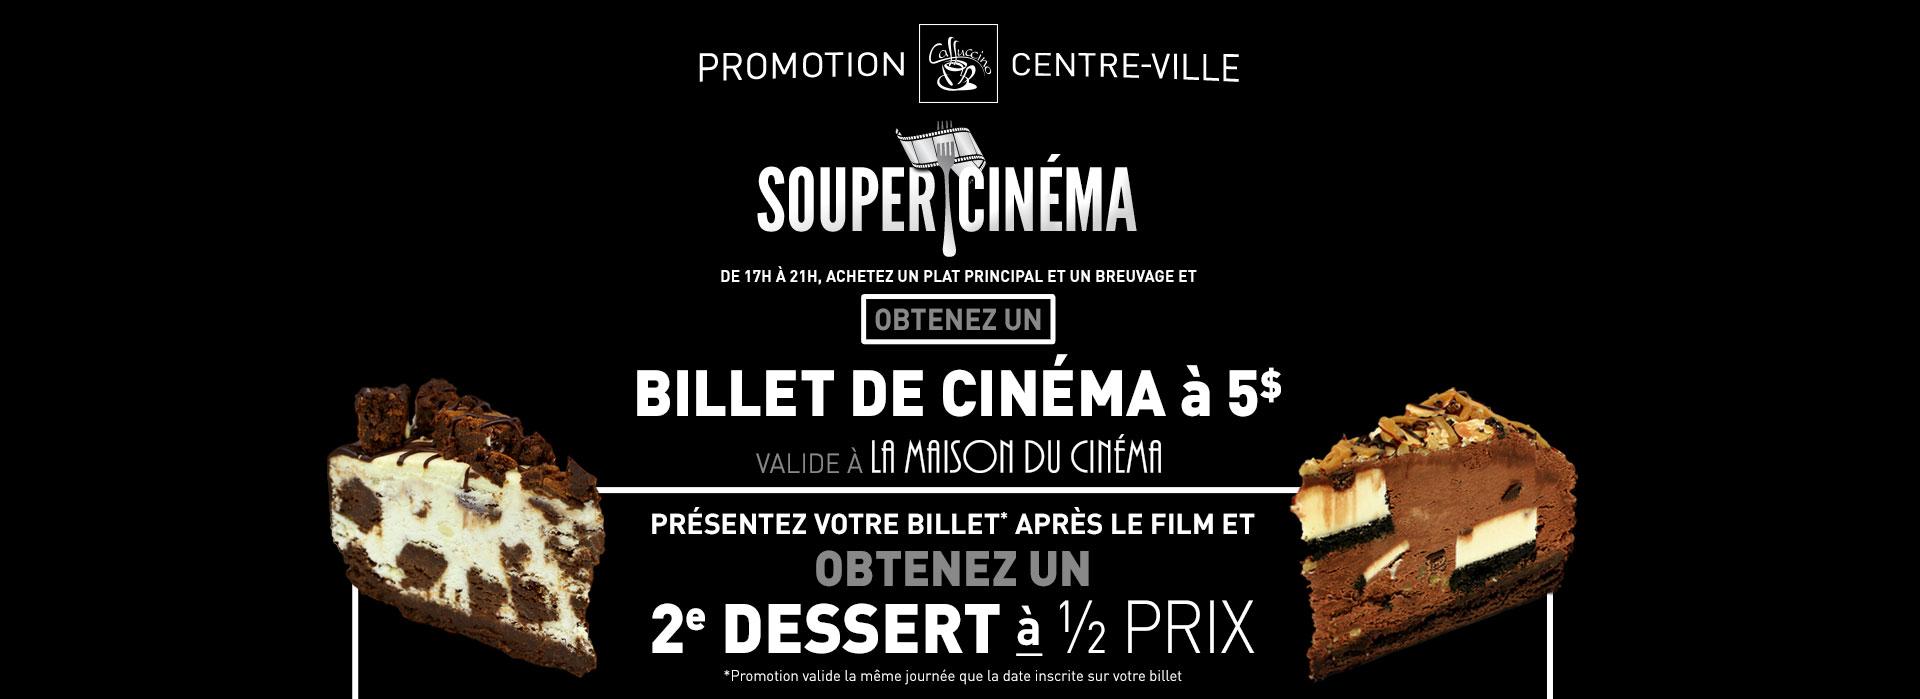 Souper Cinéma - Caffuccino Centre-ville